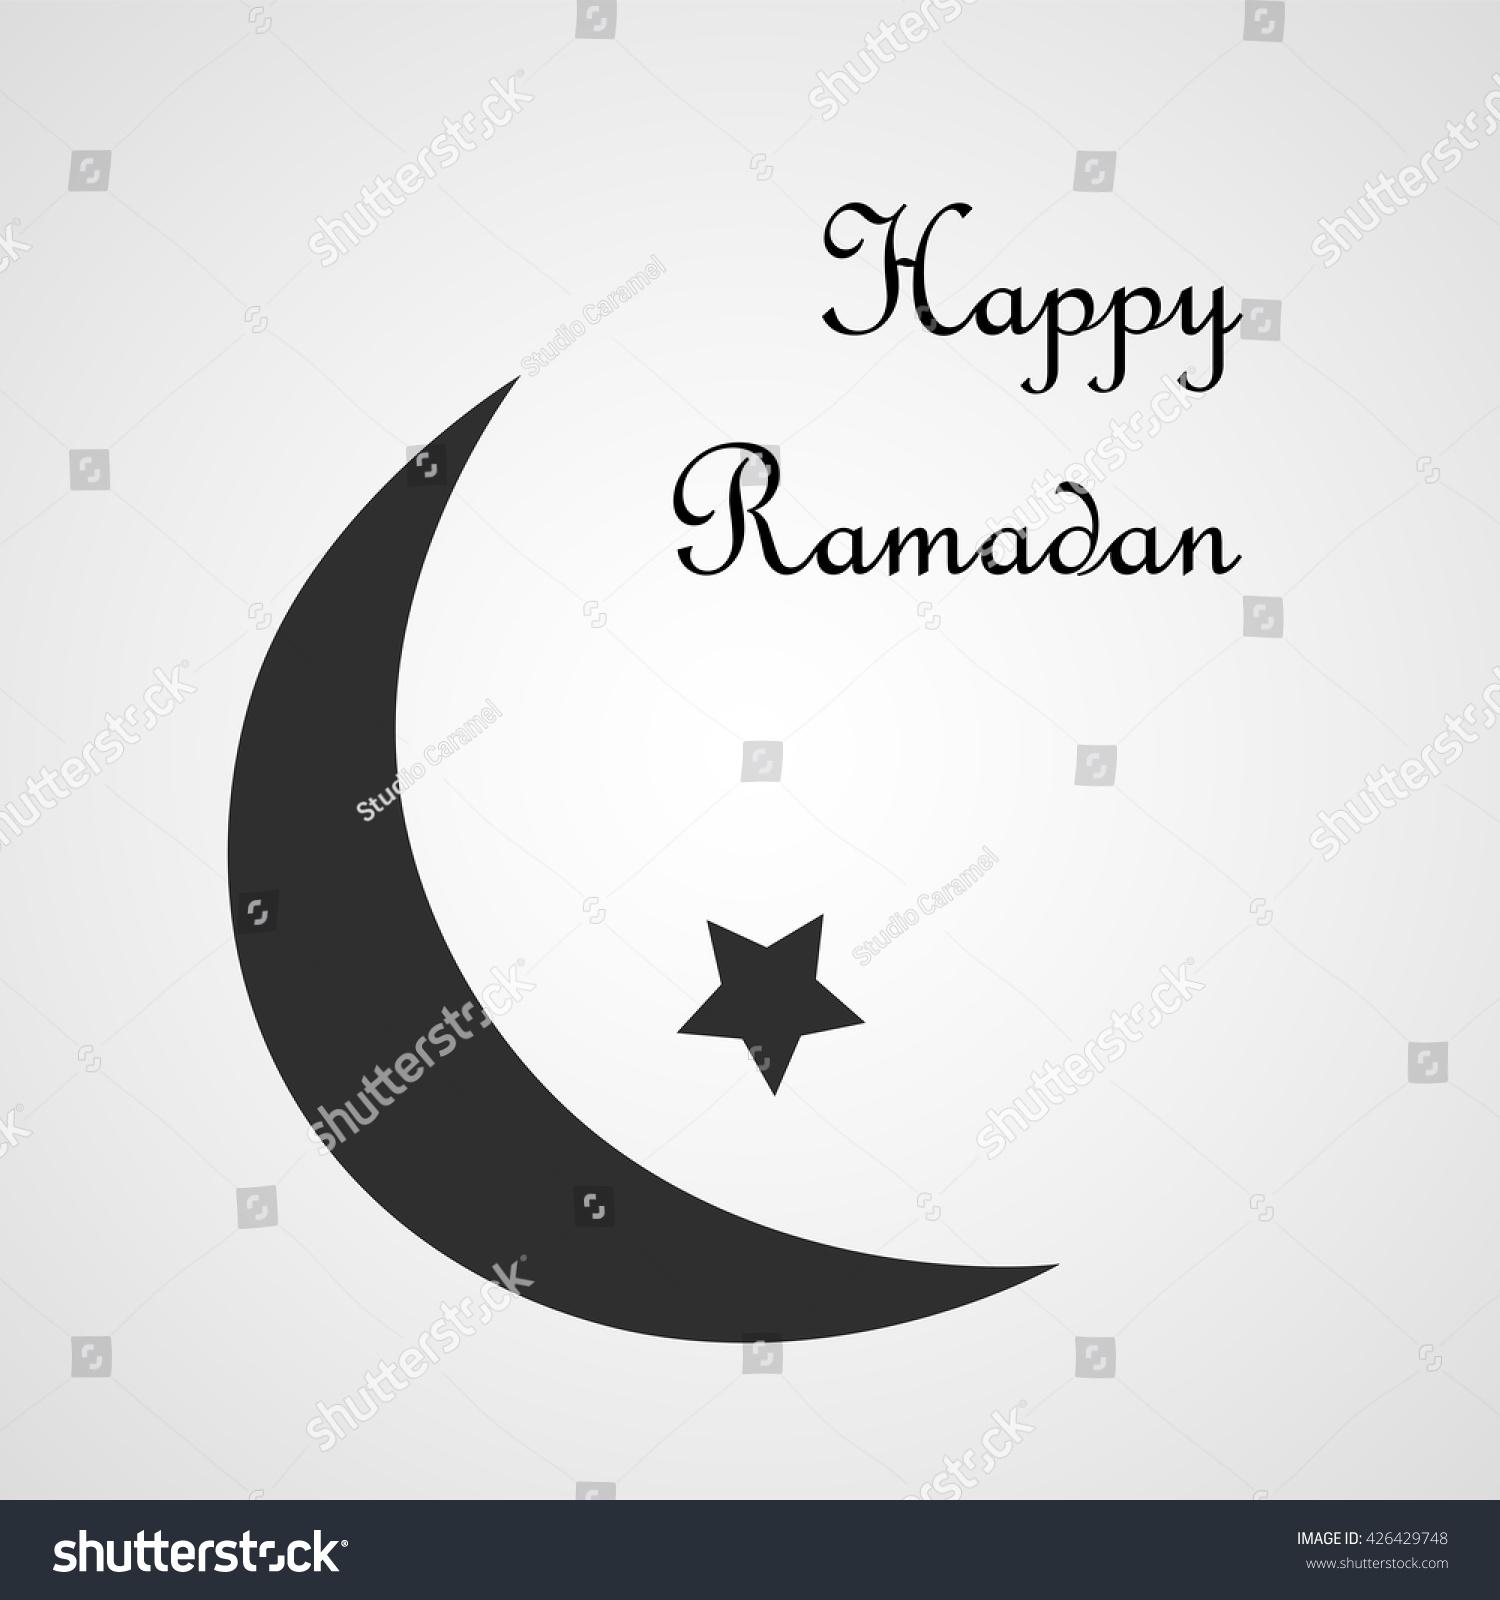 Happy ramadan postcard black crescent half stock vector 426429748 happy ramadan postcard with black crescent or half moon and a star isolated on white buycottarizona Choice Image